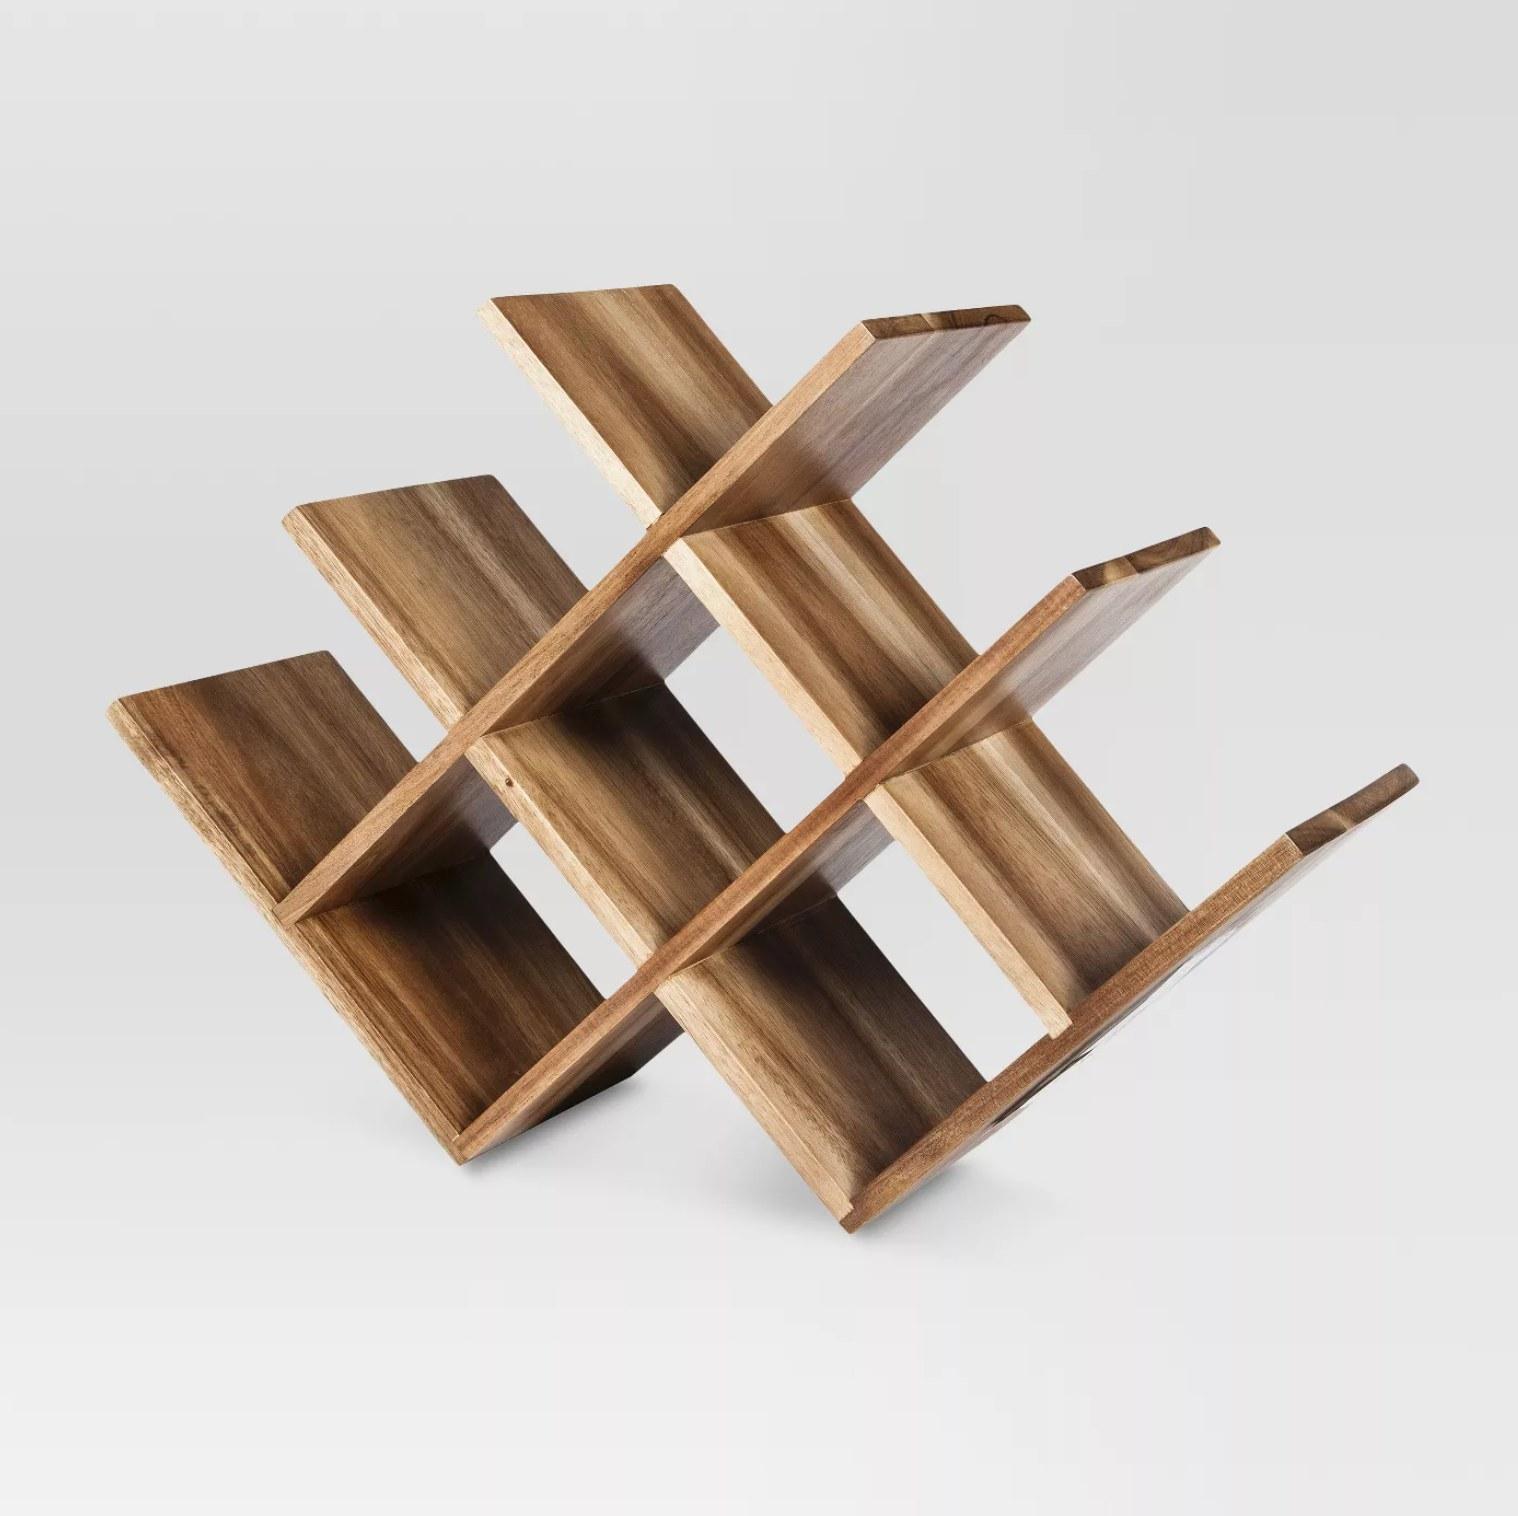 The wood rack